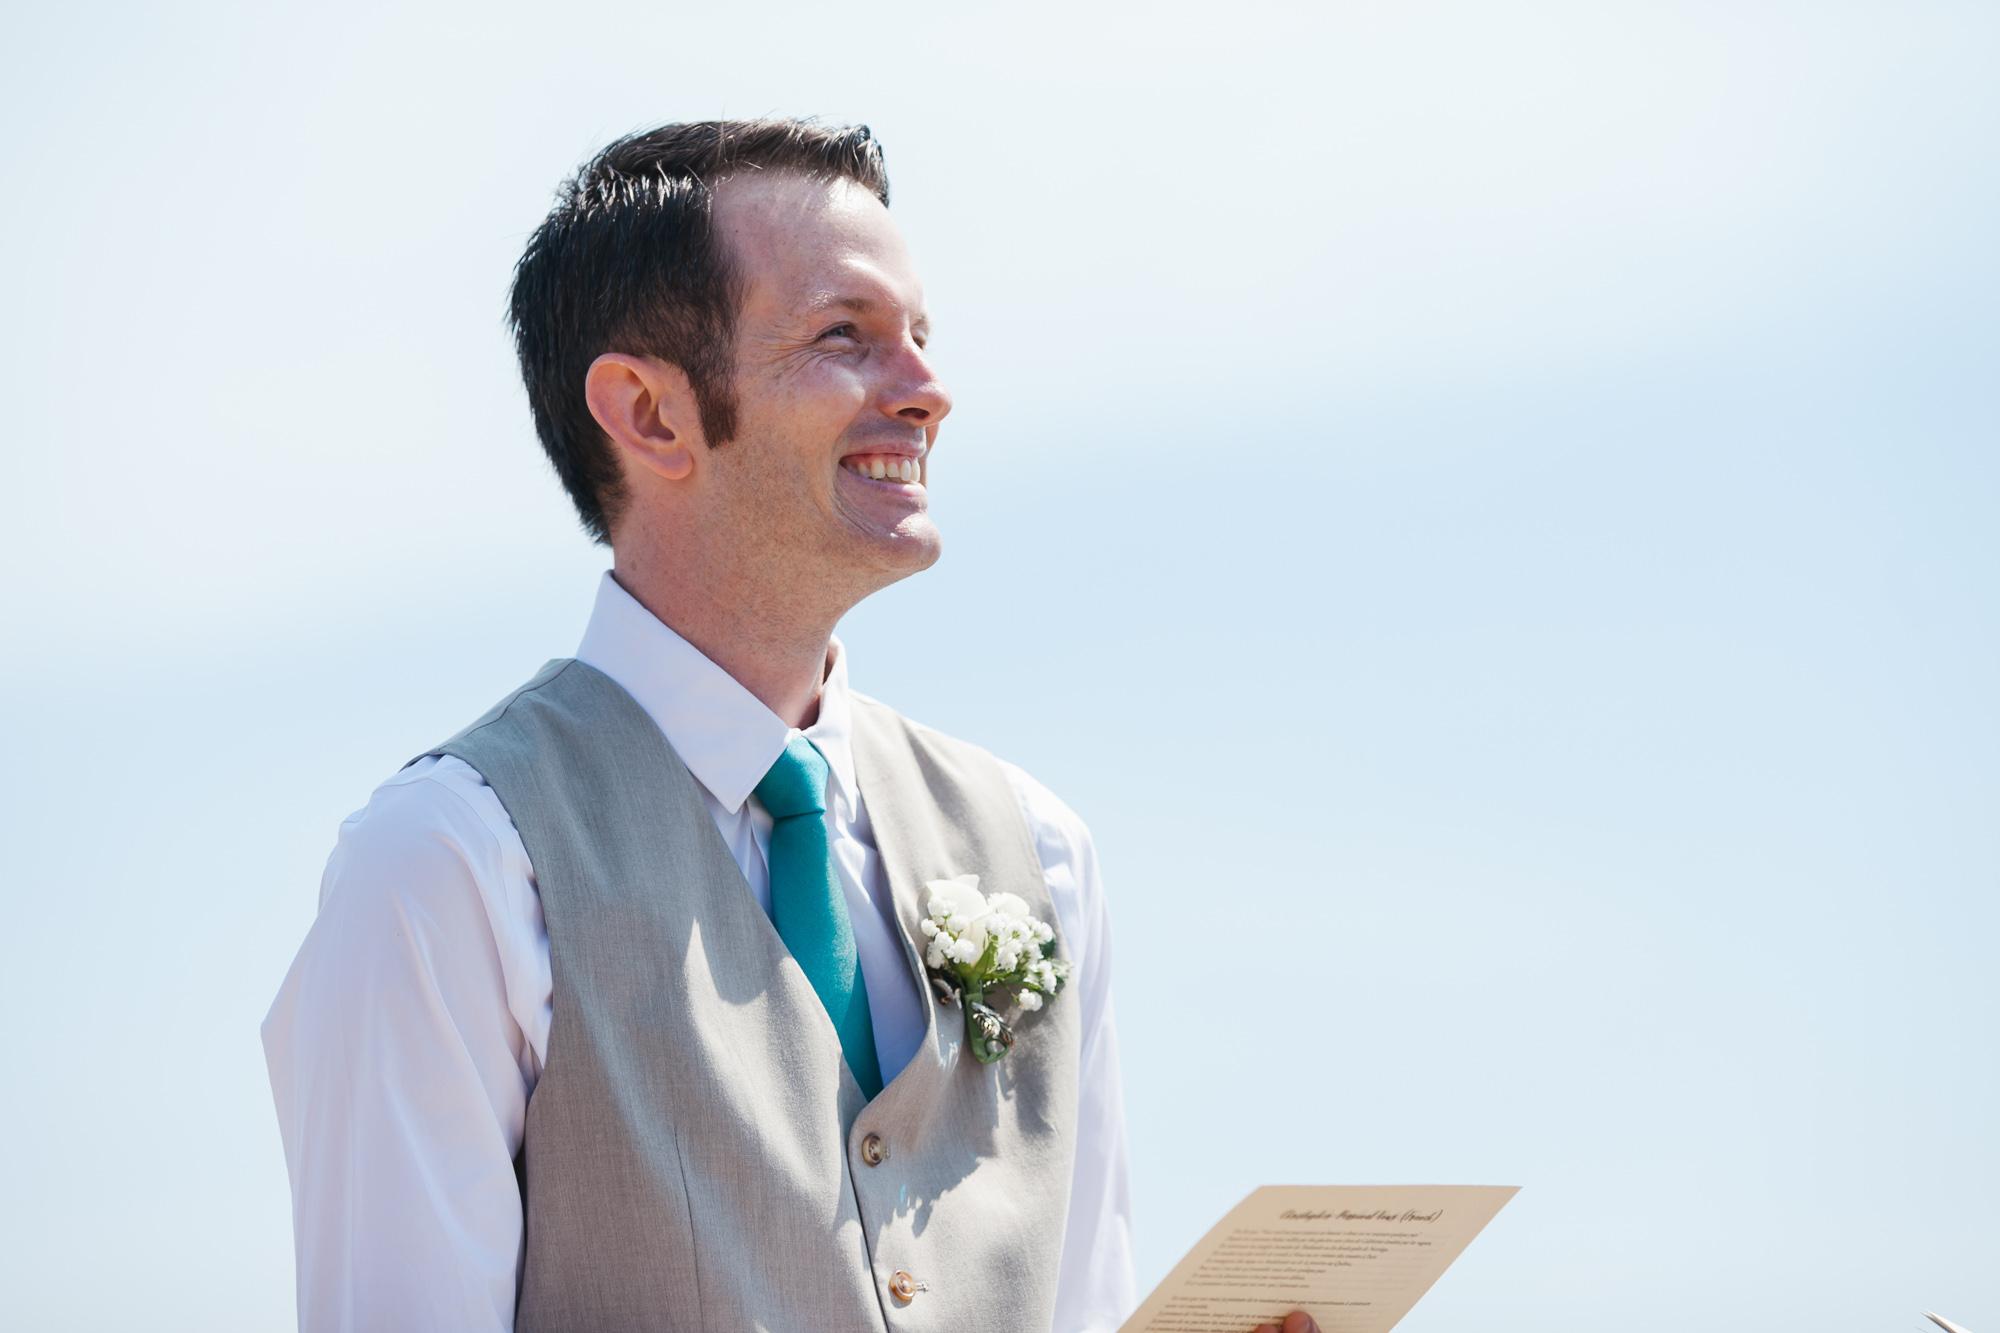 11_Cambria_wedding_samesex_coastal_intimate_Central_Coast_beach.jpg